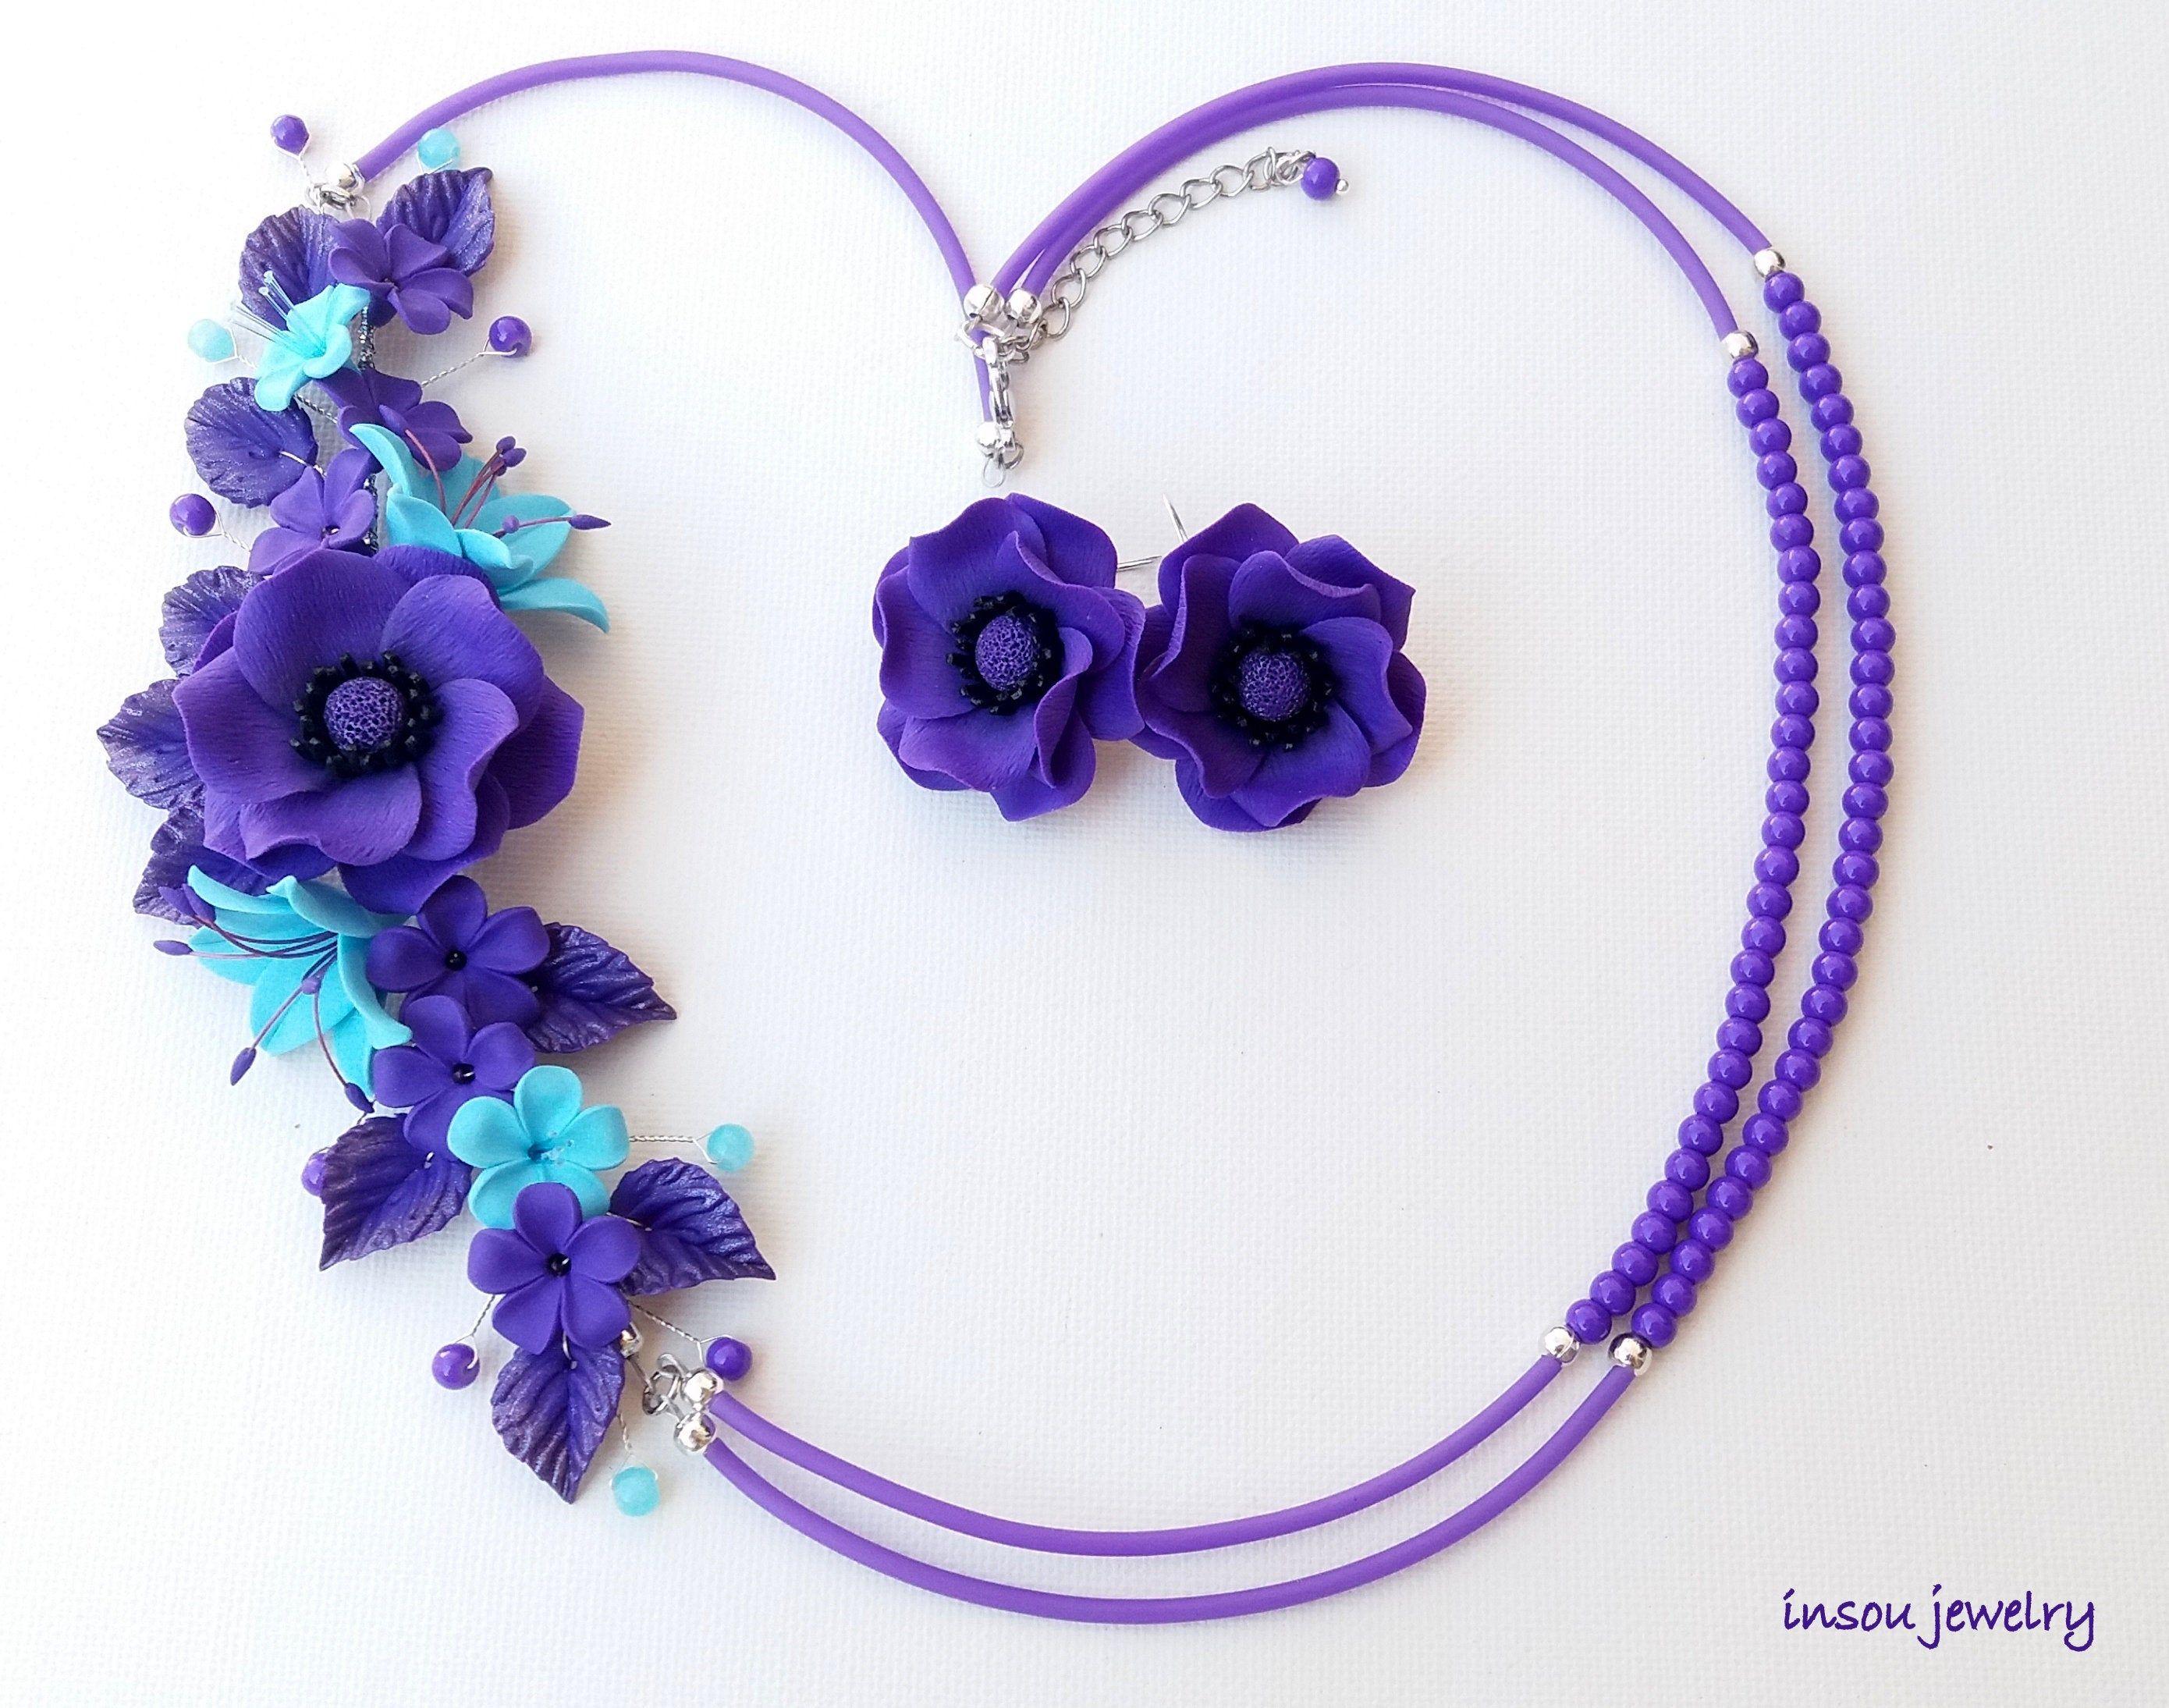 Anemone Flower Necklace Purple Light Blue Necklace Floral Necklace Gift For Mom Gift For Her Floral Fashion Autumn Jewelry Flowers Flower Necklace Floral Necklace Flower Bracelet